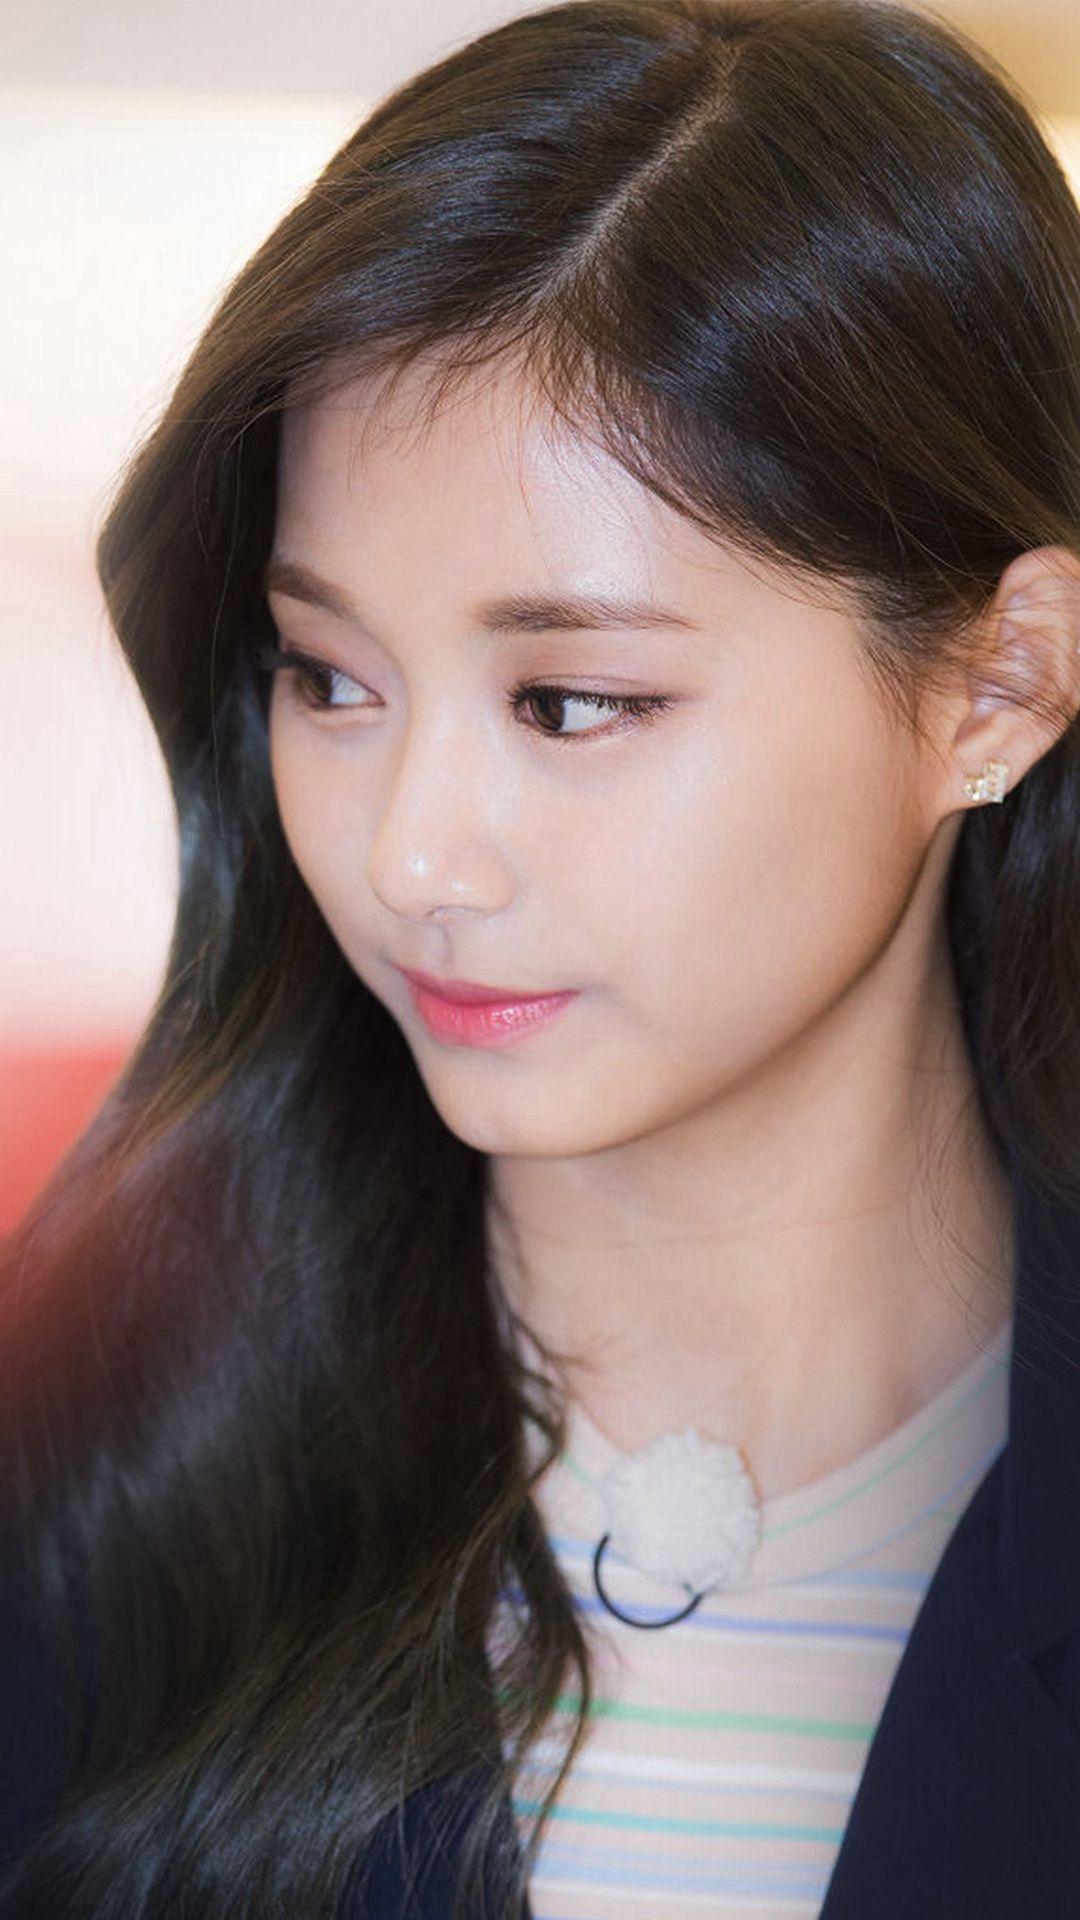 Kpop Tzuyu Twice Girl Cute iPhone 8 wallpaper